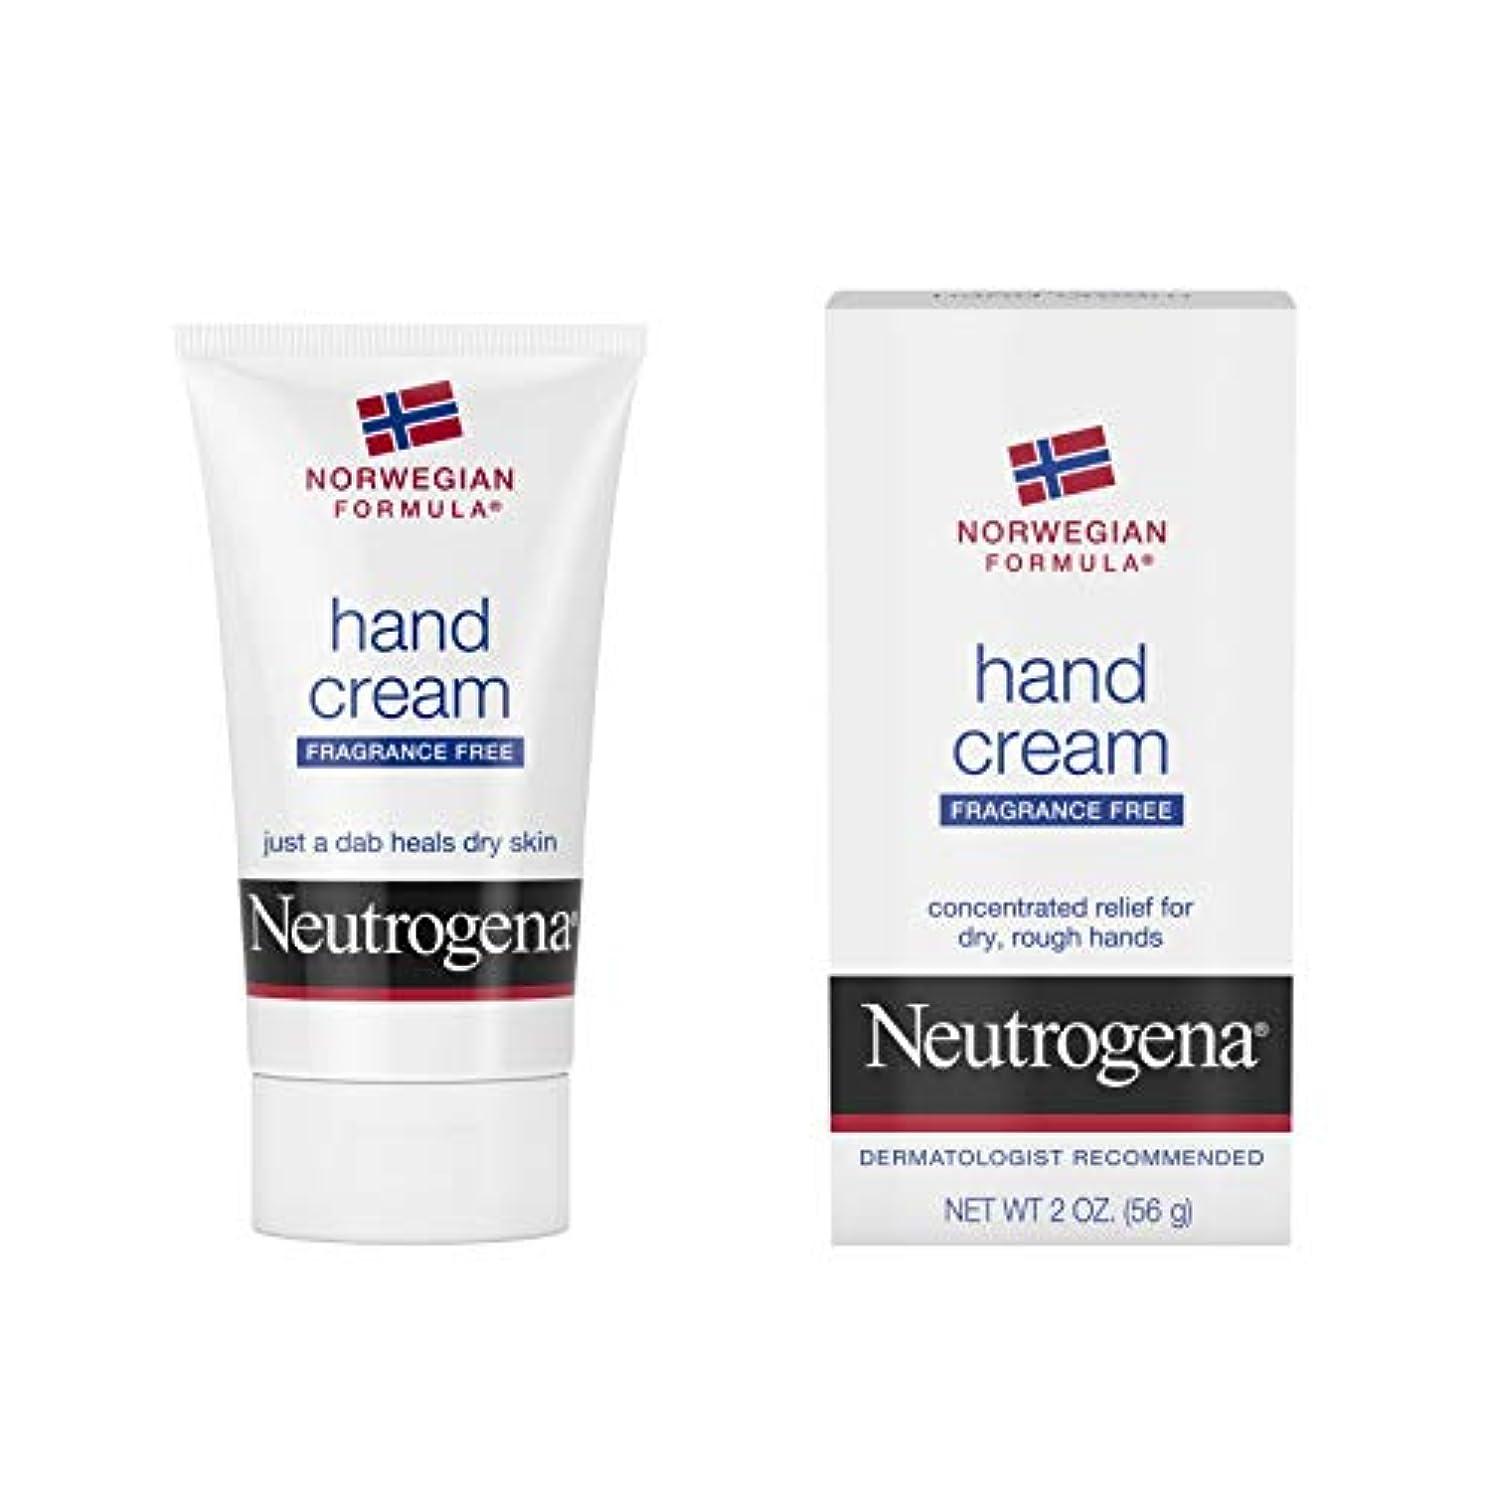 罪悪感物理学習者Neutrogena Norwegian Formula Hand Cream Fragrance-Free 60 ml (並行輸入品)